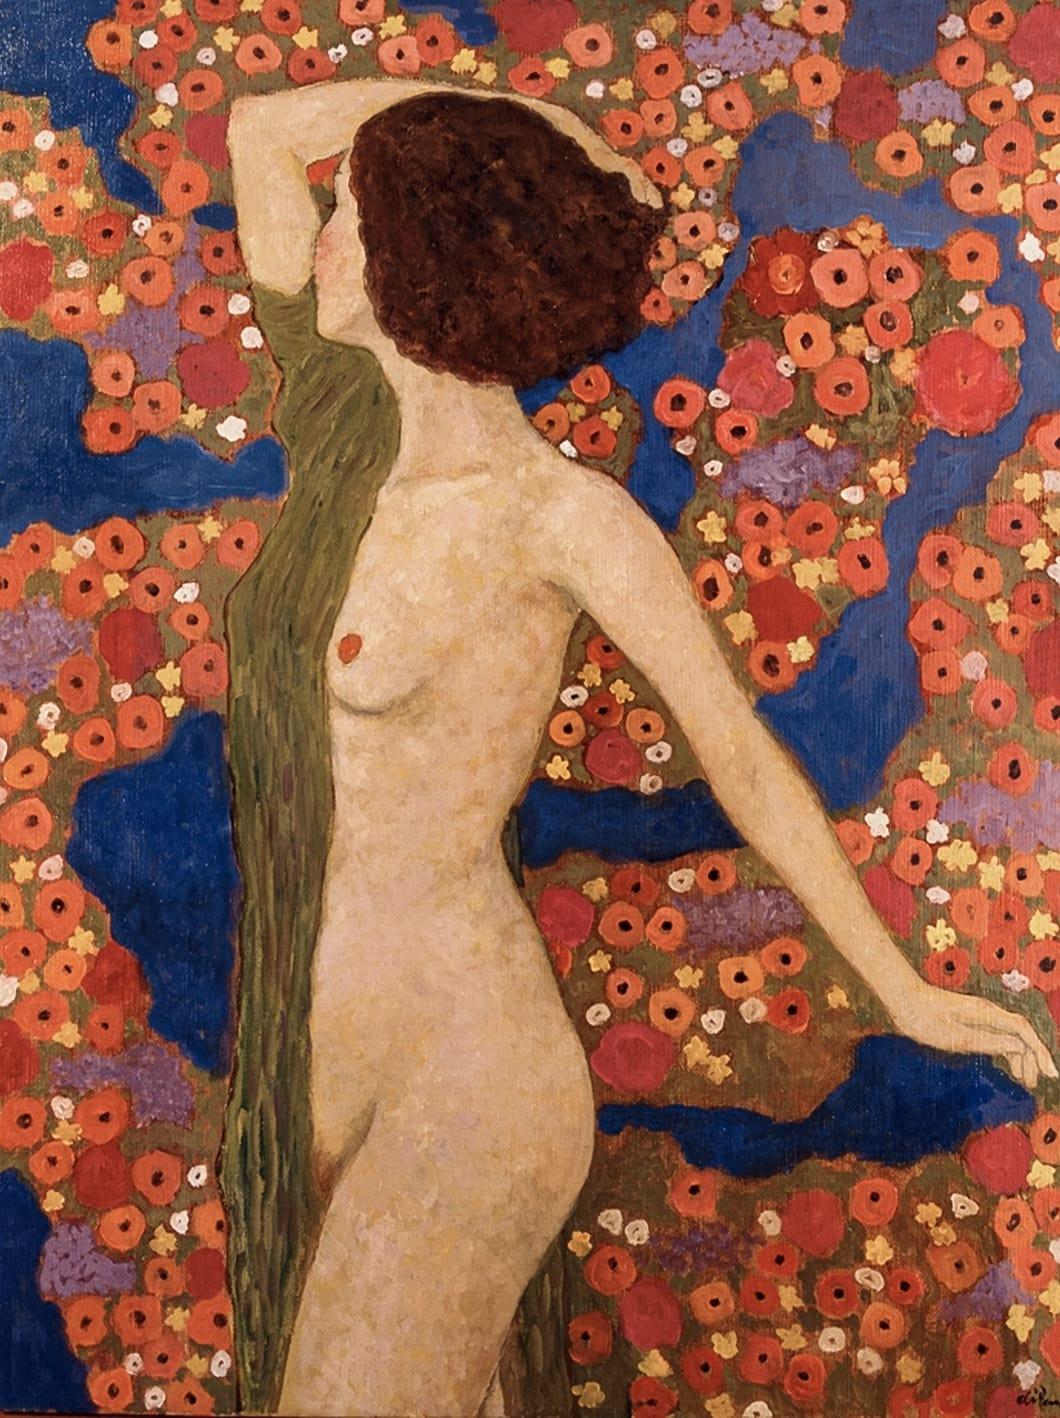 Xi Pan Nude#1 09/10